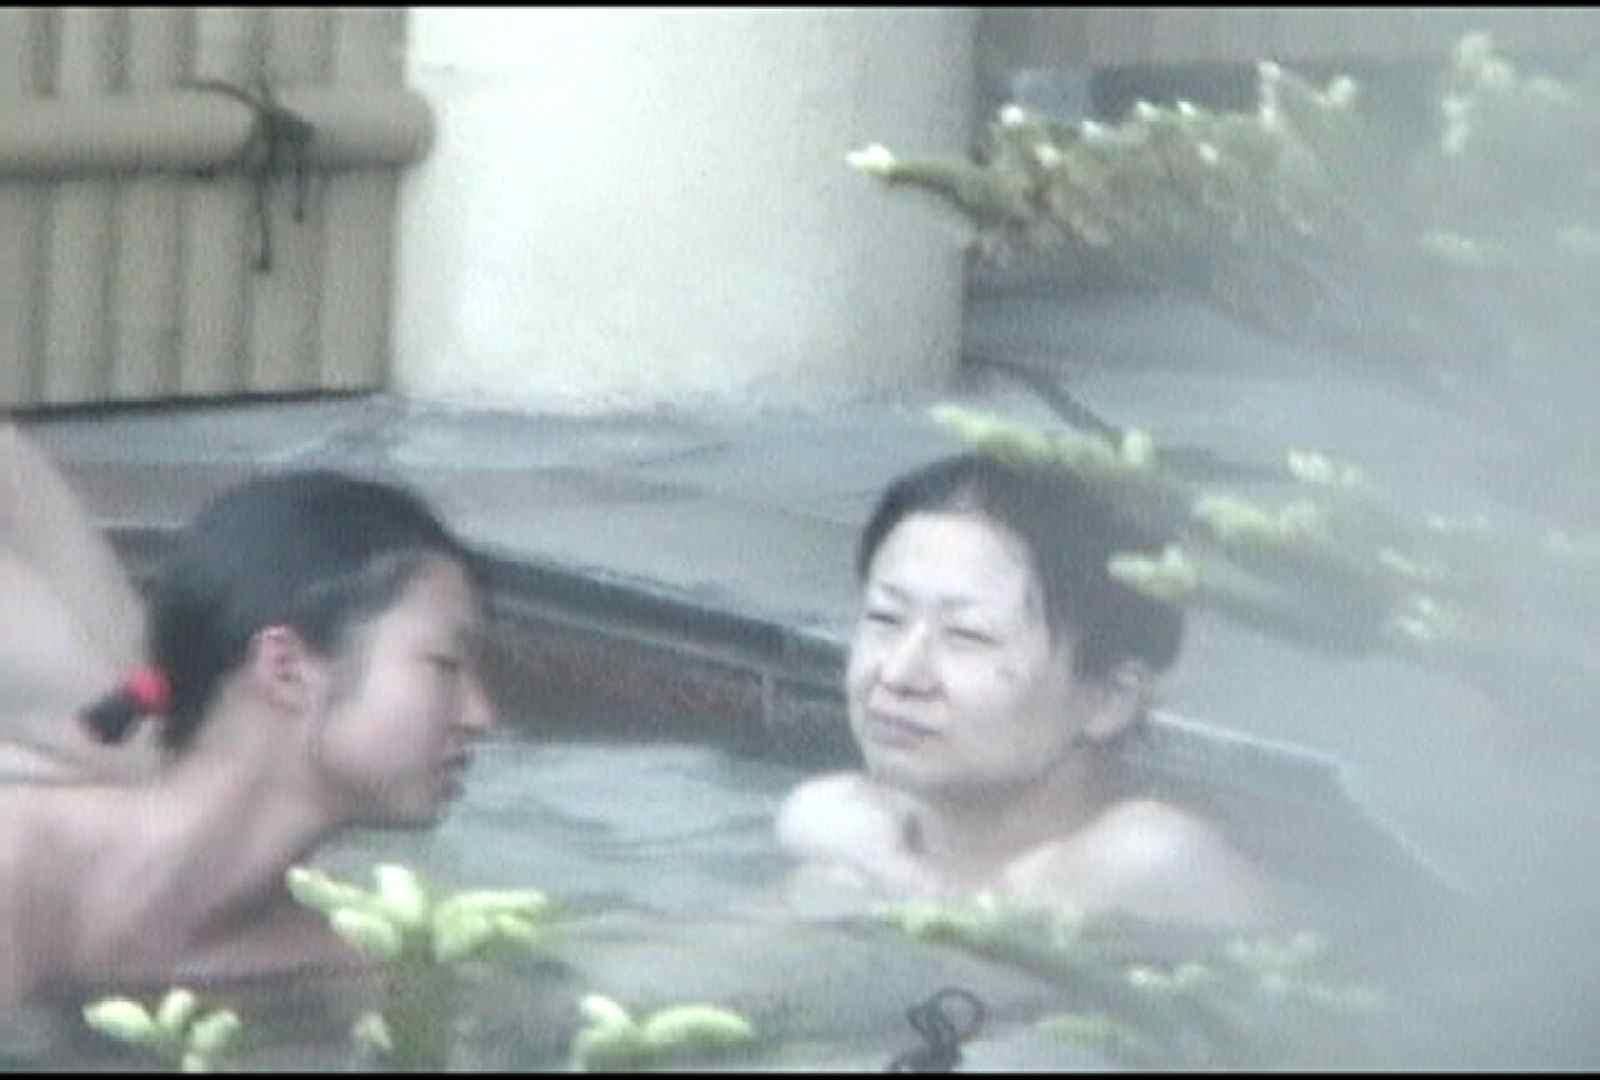 Aquaな露天風呂Vol.15 盗撮映像  42Pix 24